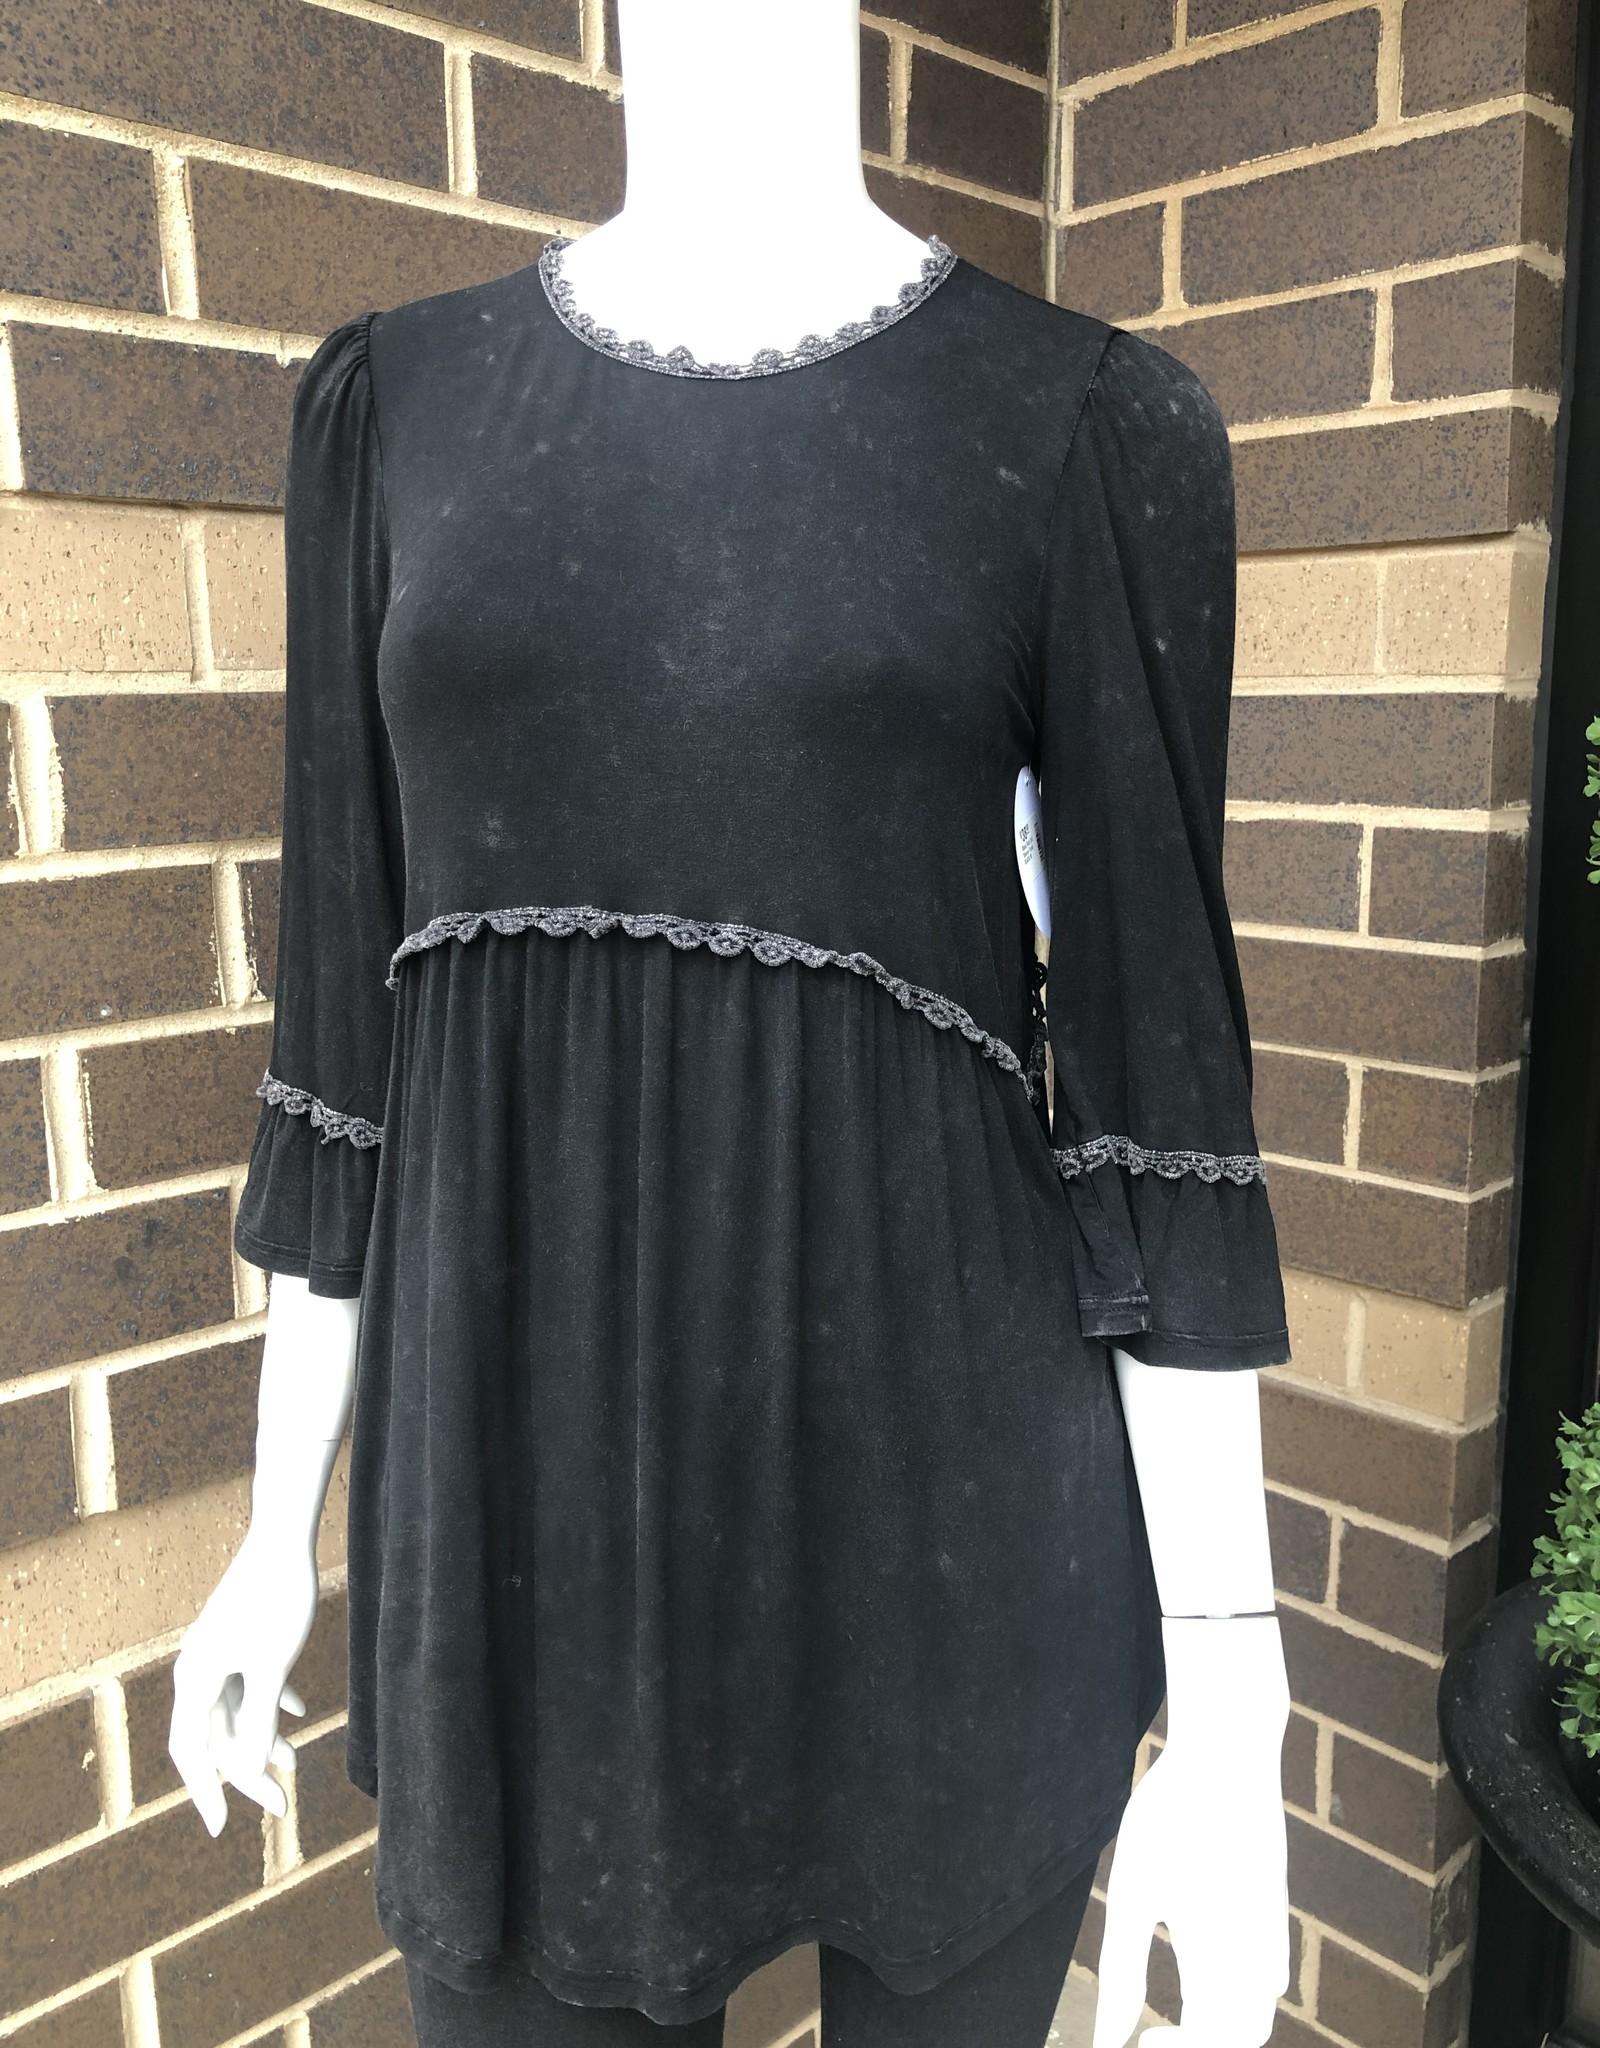 Black Knit 3/4 Sleeve Tunic